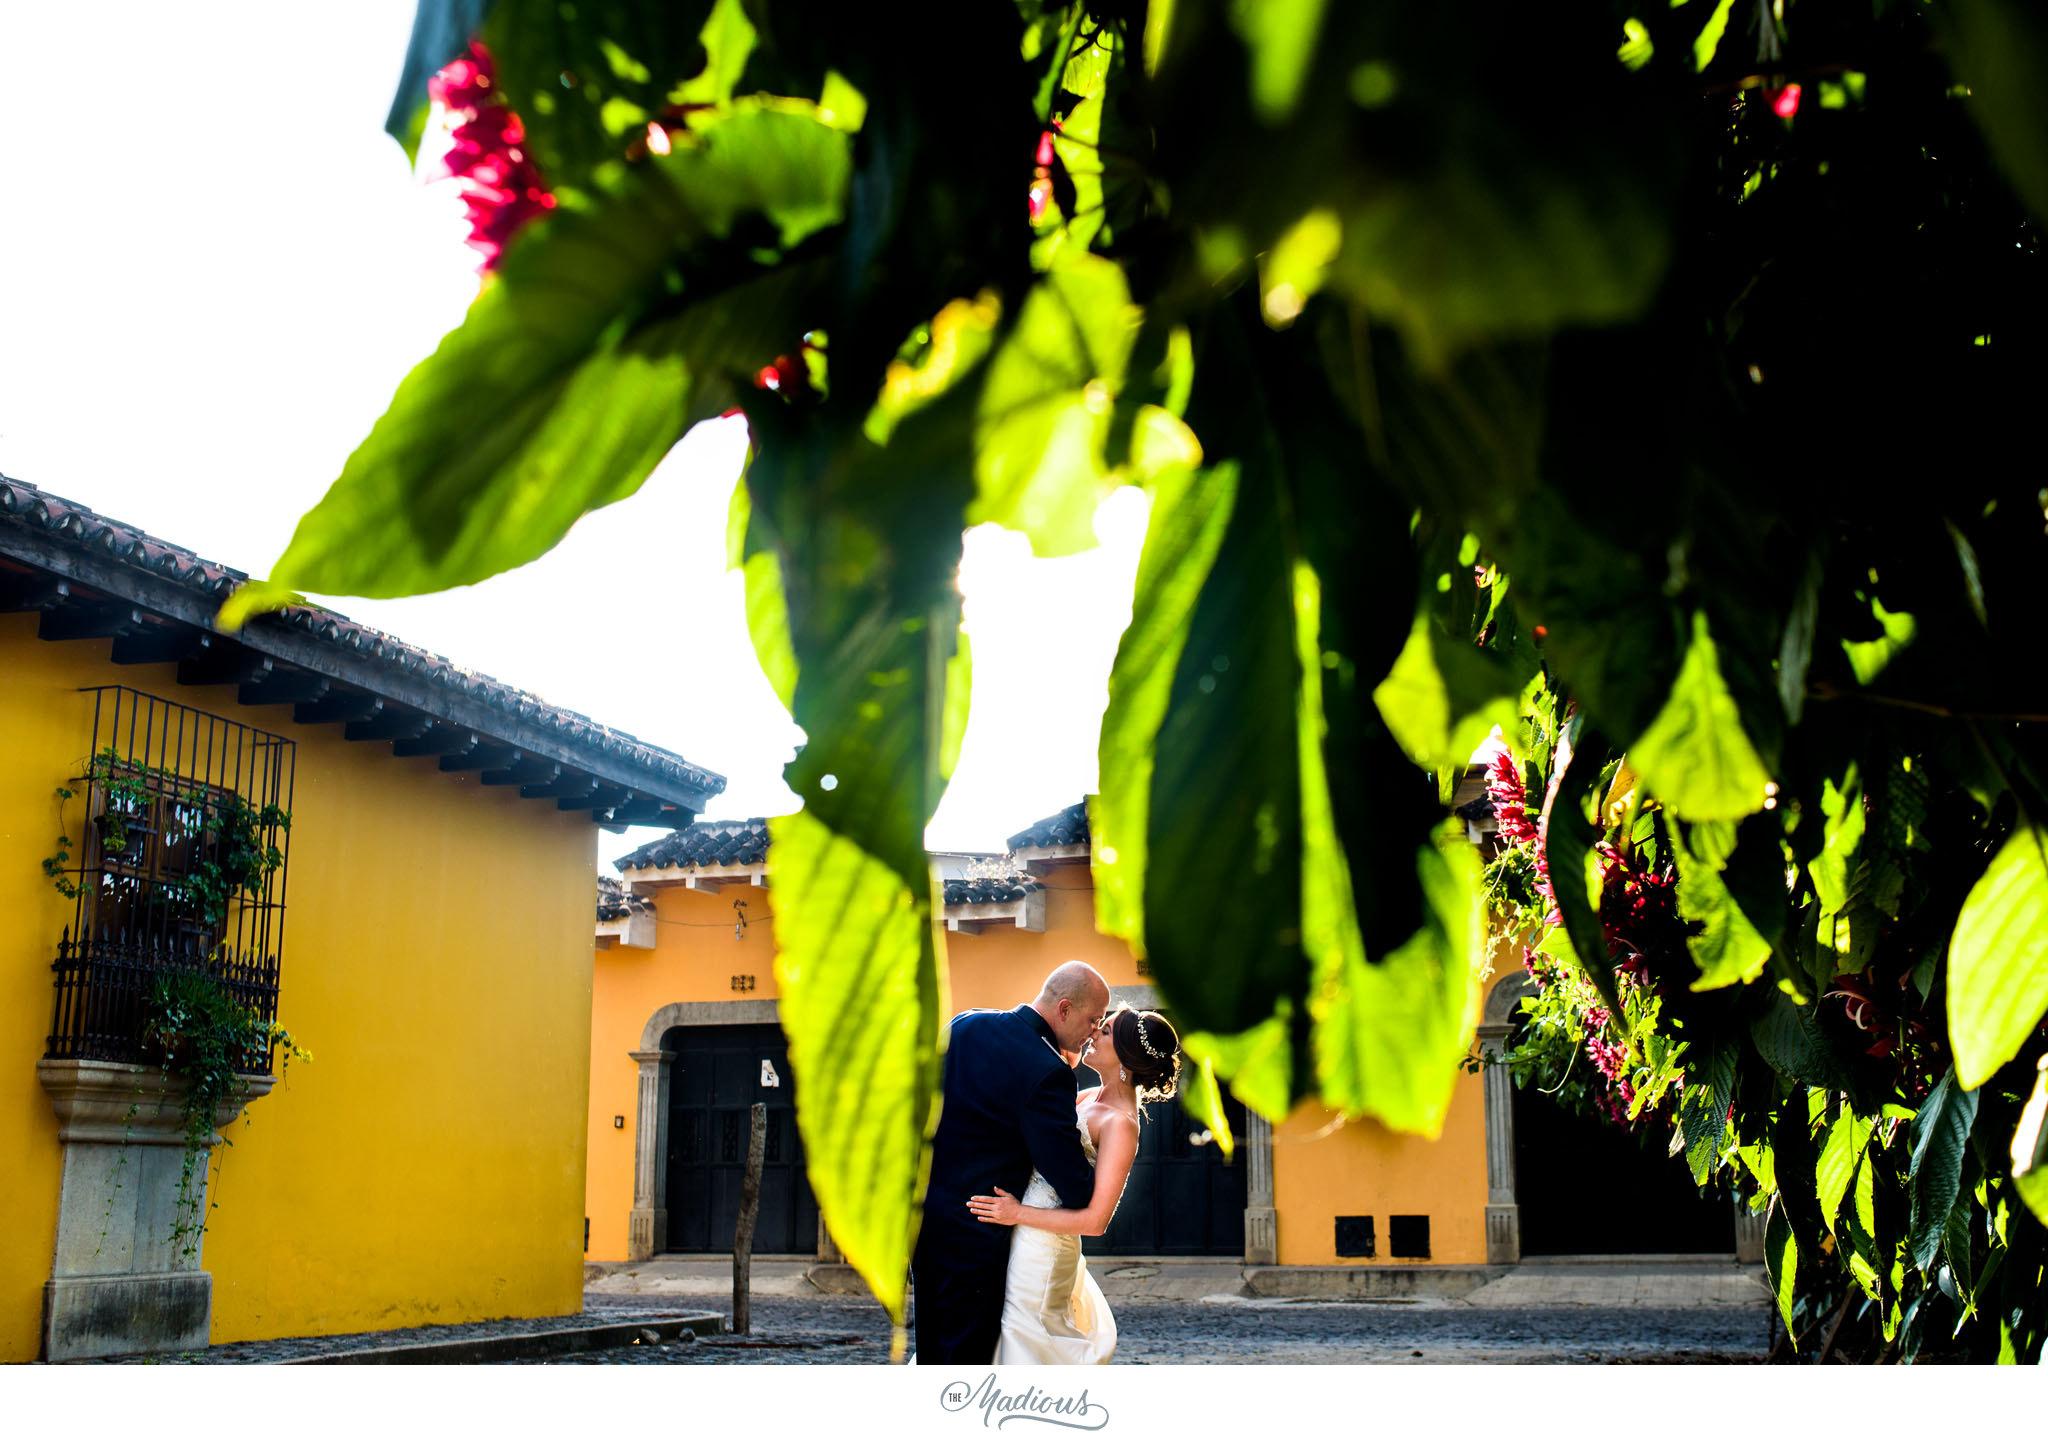 Leigh_Rob_Antigua_Guatemala_Santa_Clara_Destination_Wedding_38.JPG